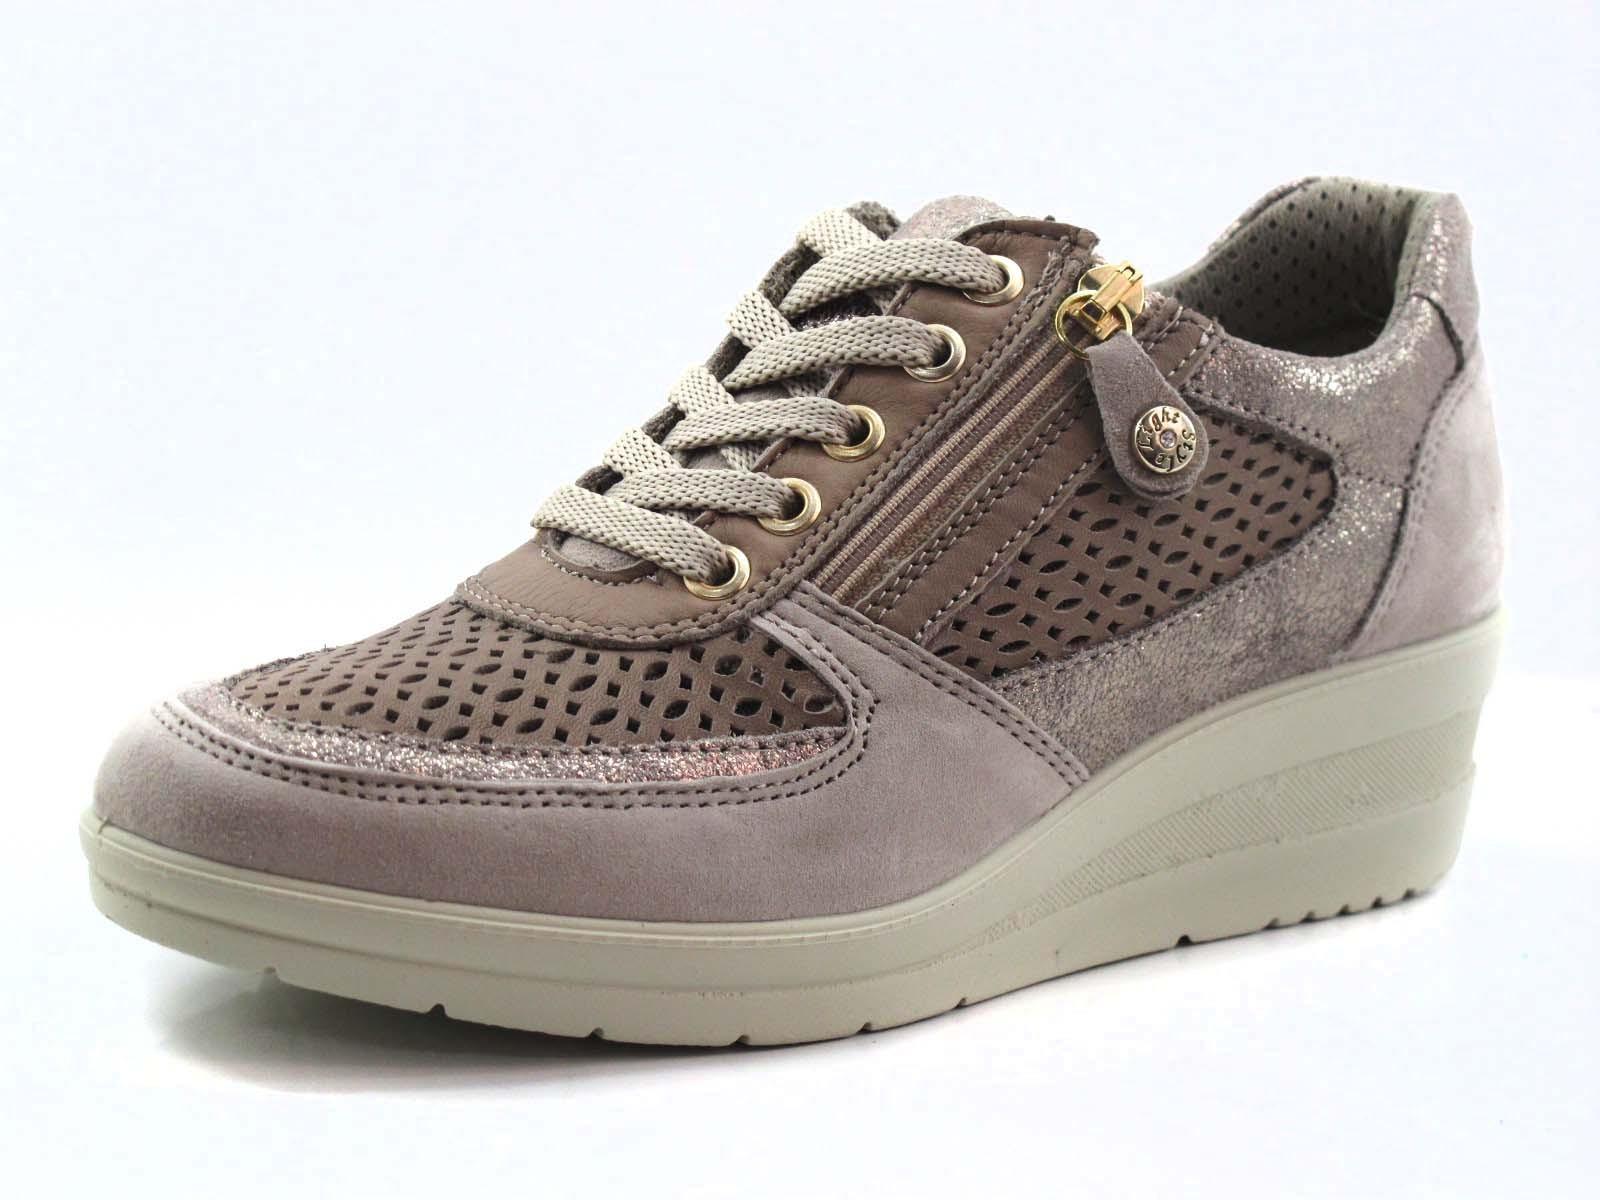 Comprar zapatos IMAC plantilla extraíble beige en Dino Zapatos